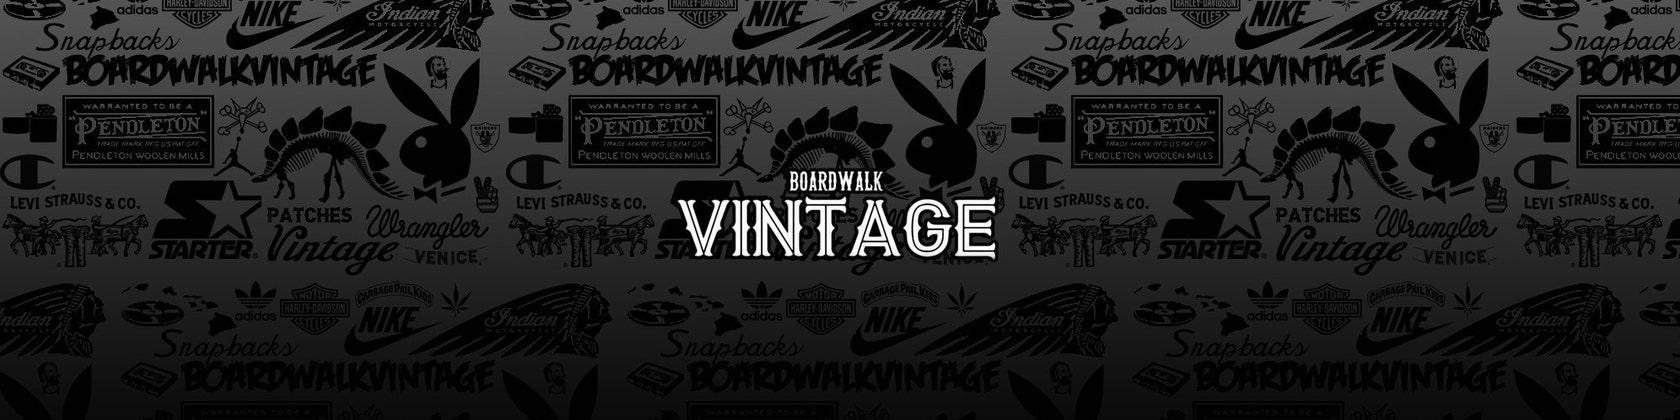 086ec7b18eb2 Boardwalk Vintage by BoardwalkVntage on Etsy